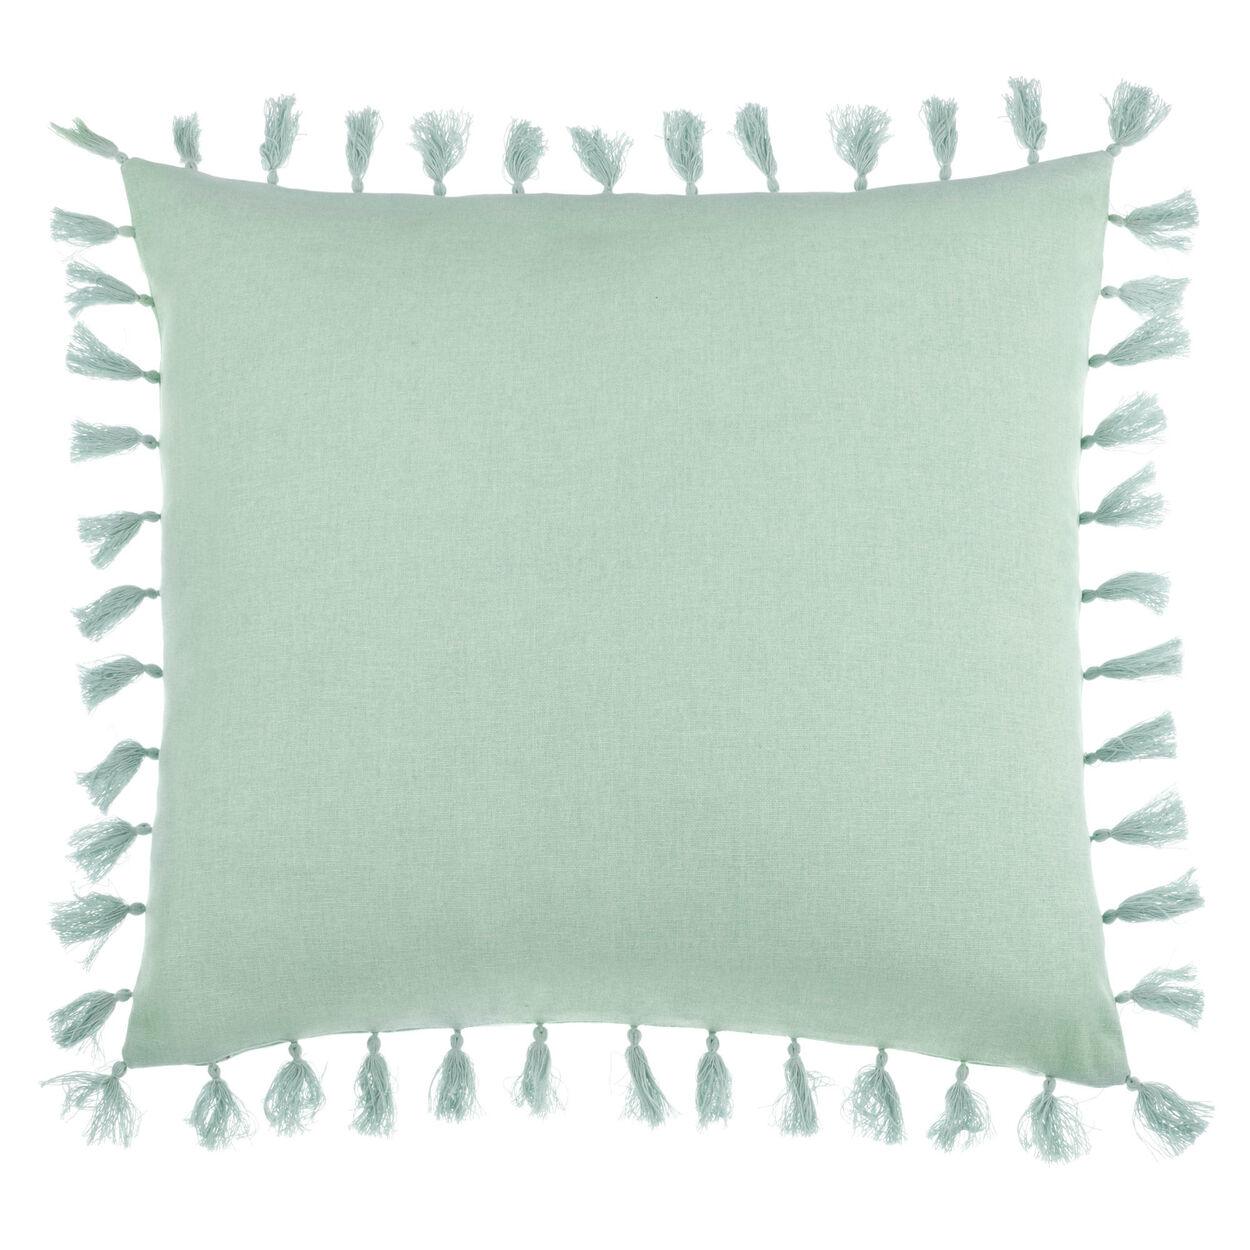 "Mi Casa Decorative Pillow Cover with Pom-Poms 18"" X 18"""